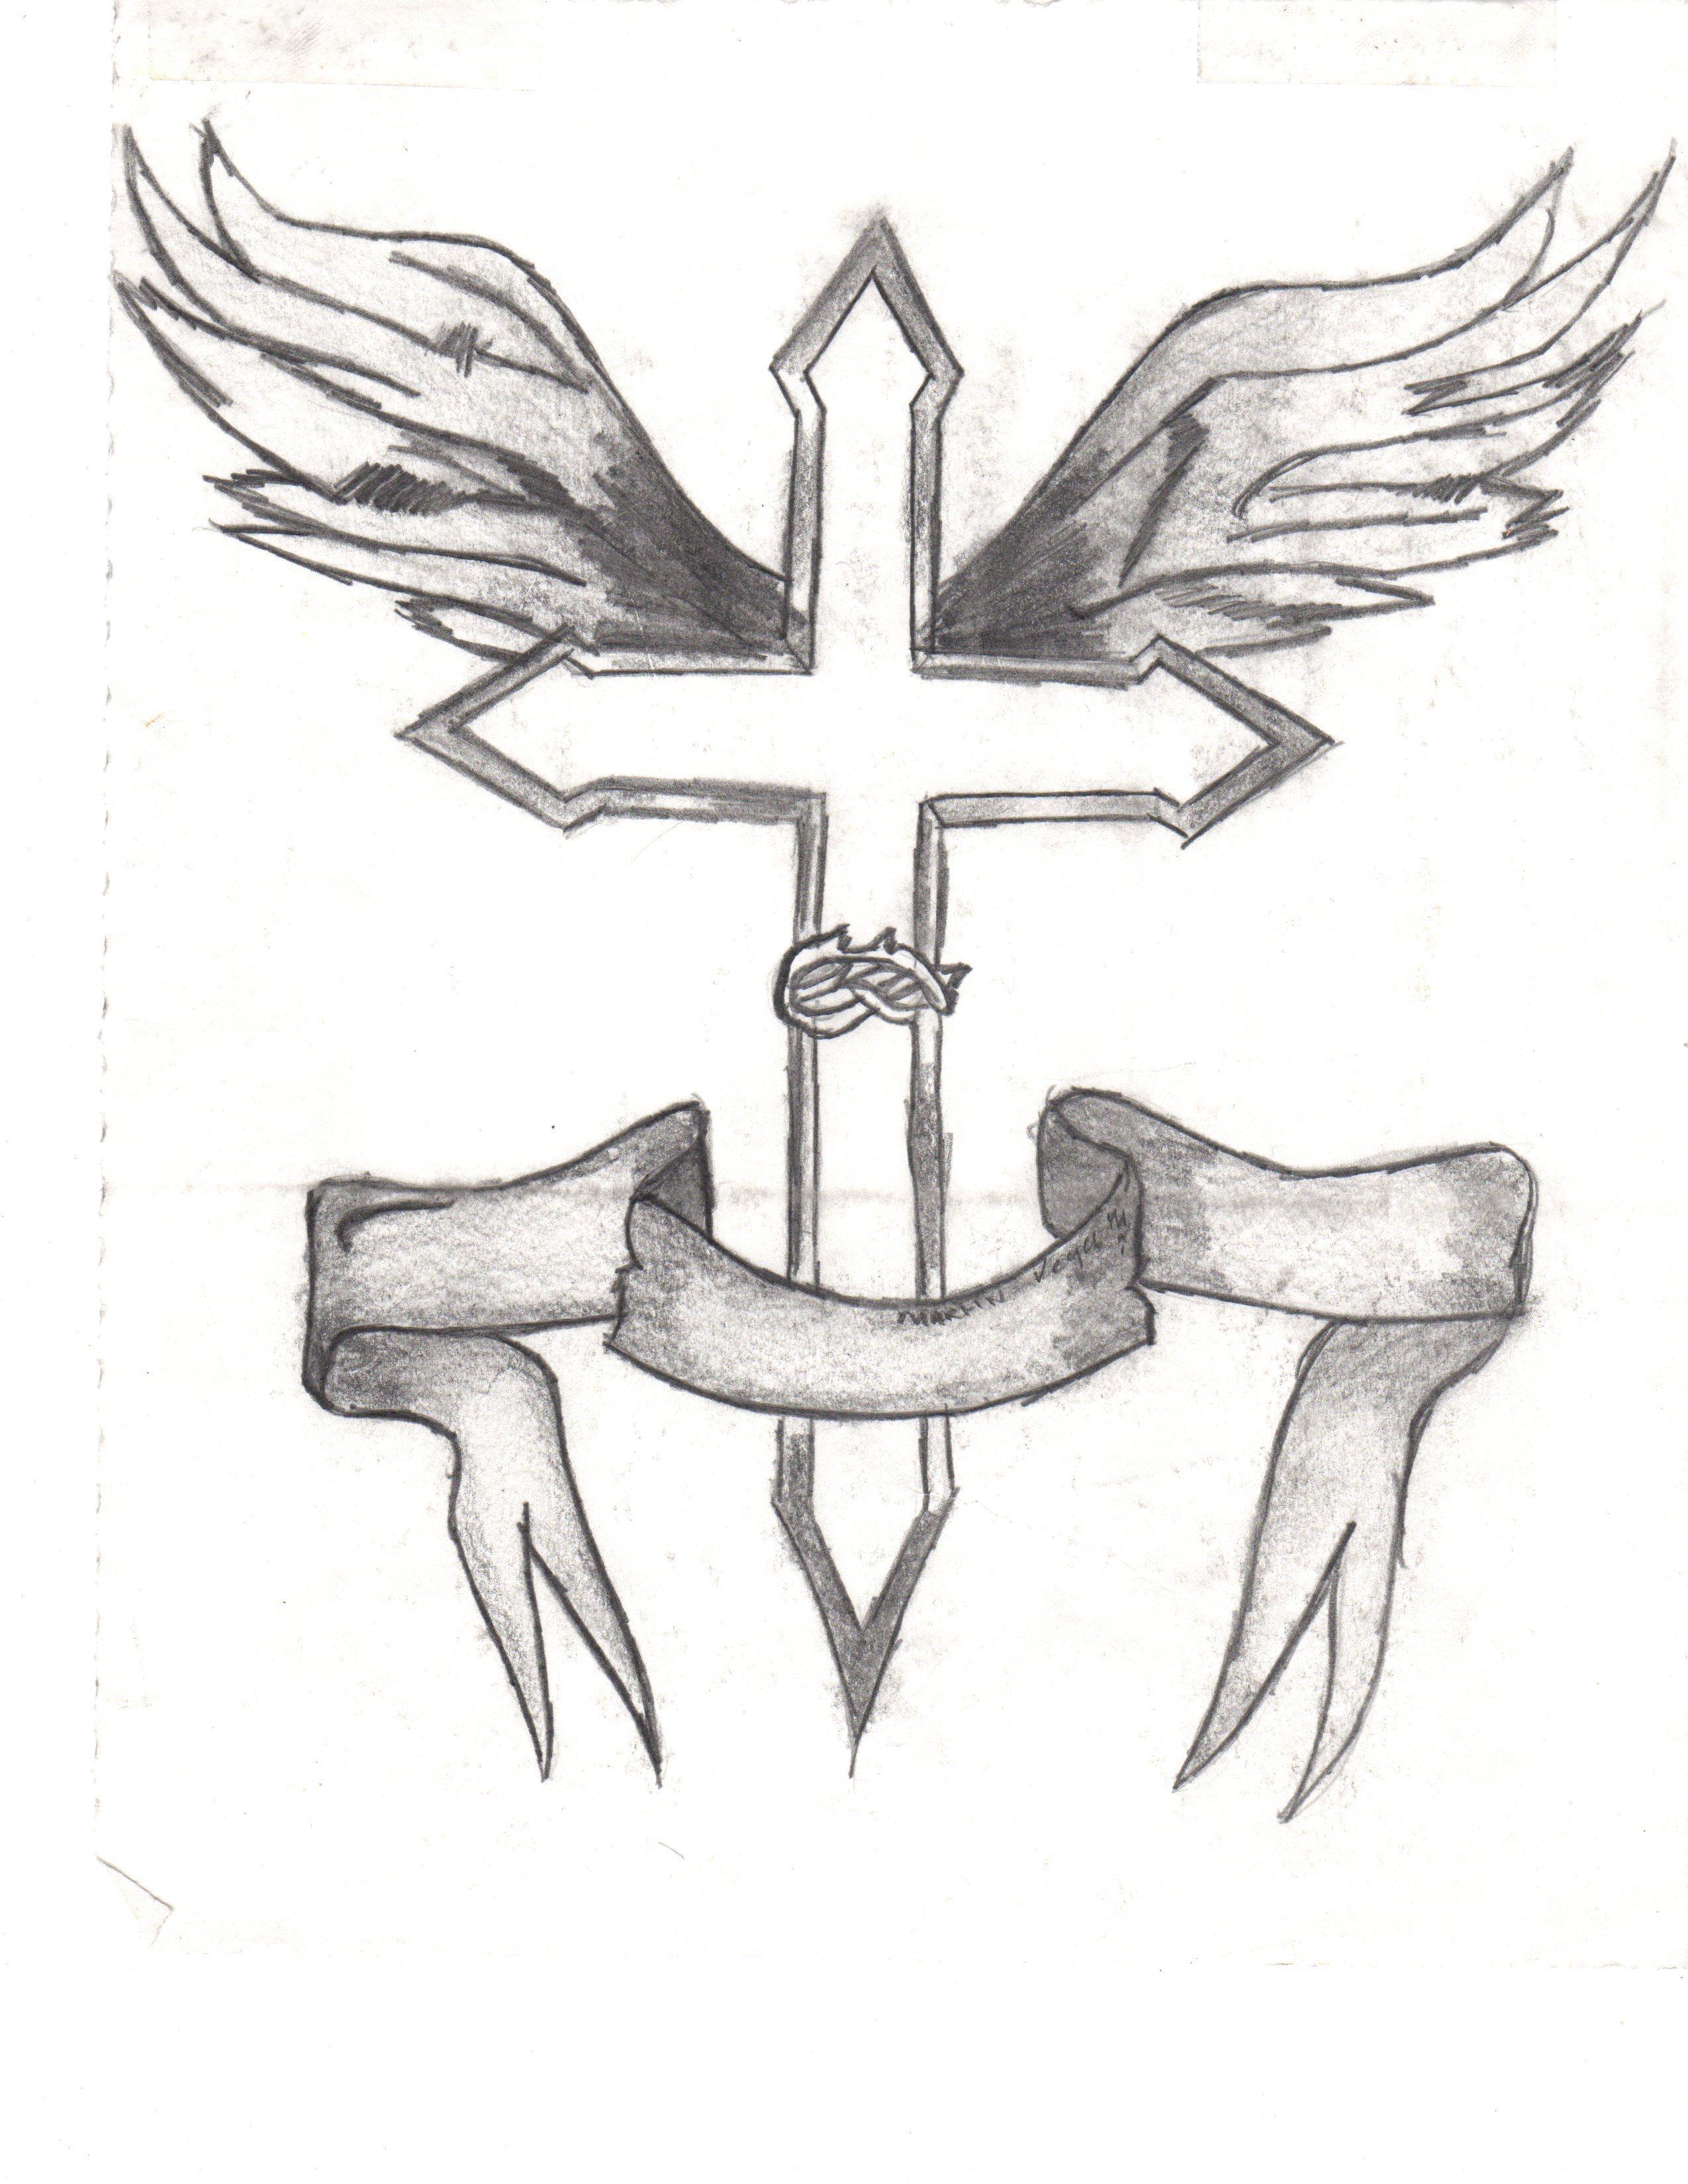 2550x3300 Pencil Drawings Of The Cross